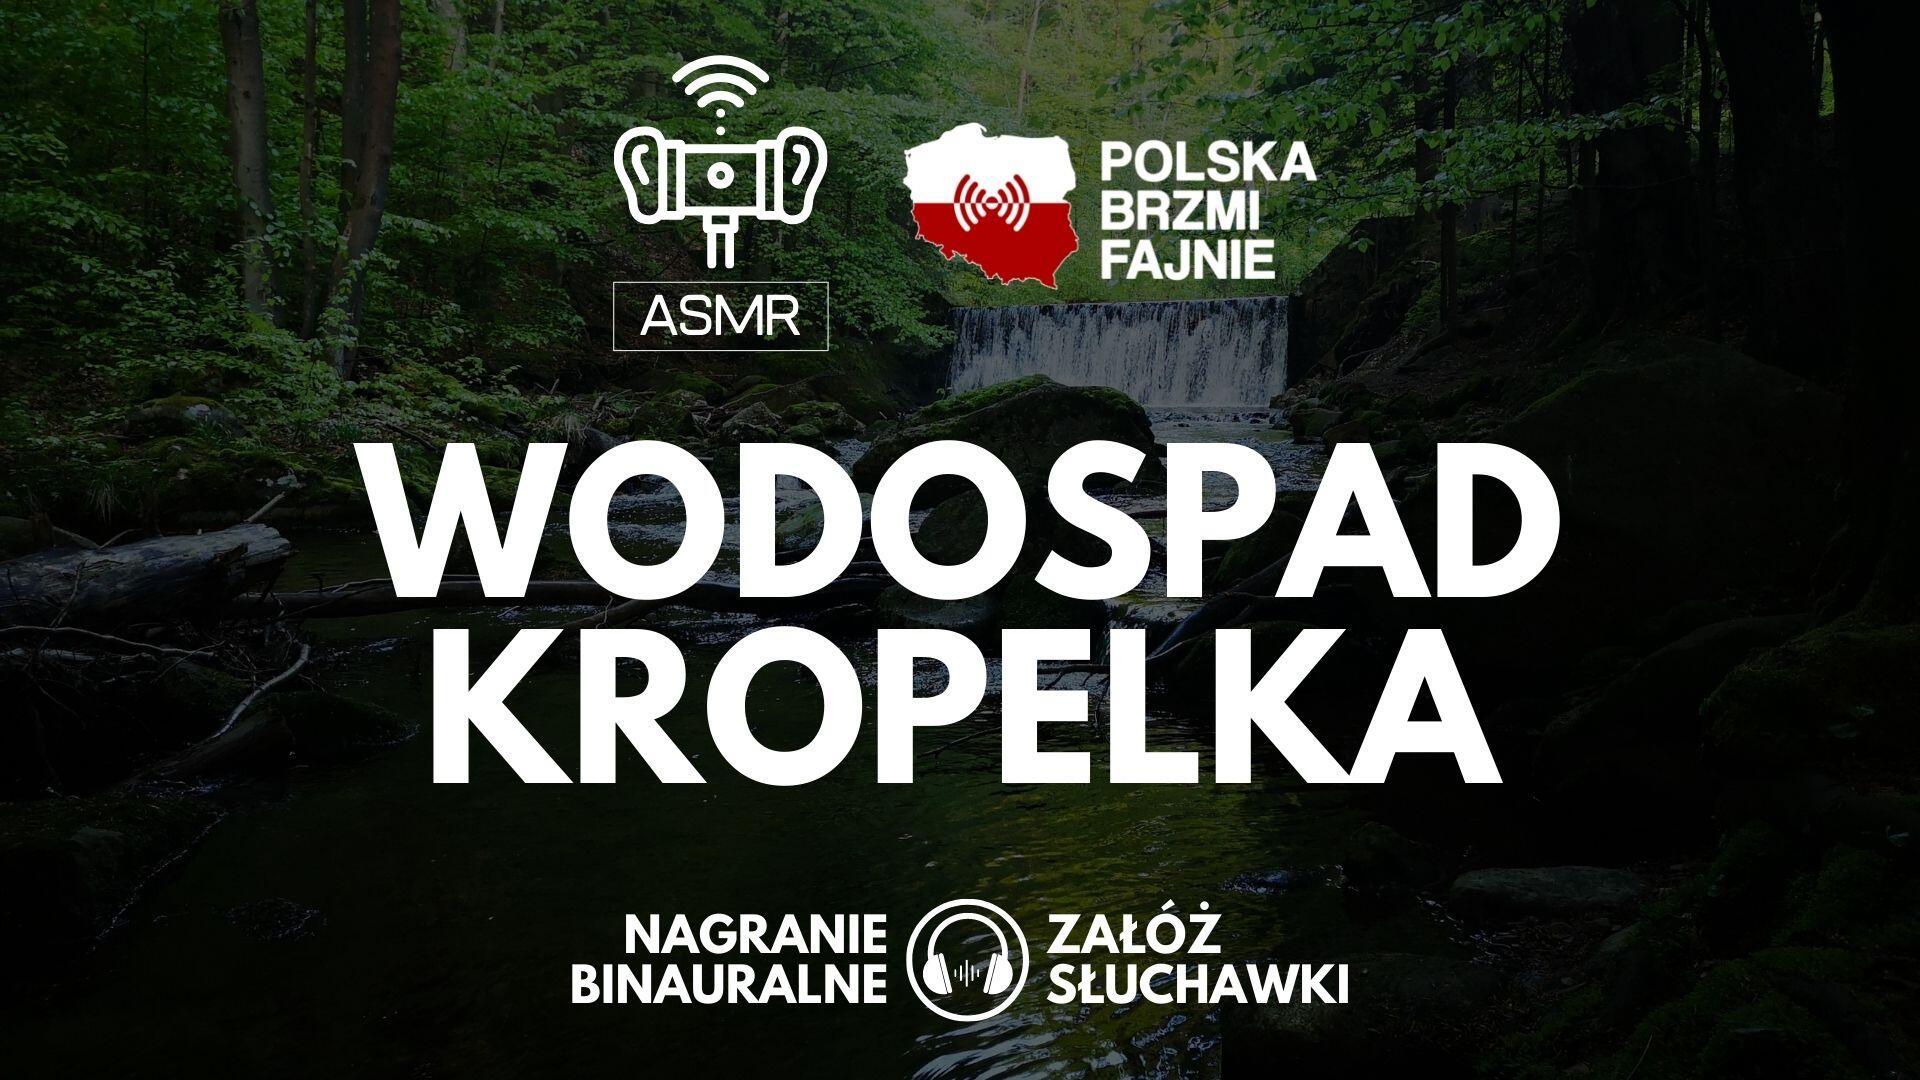 PBF23 Wodospad Kropelka